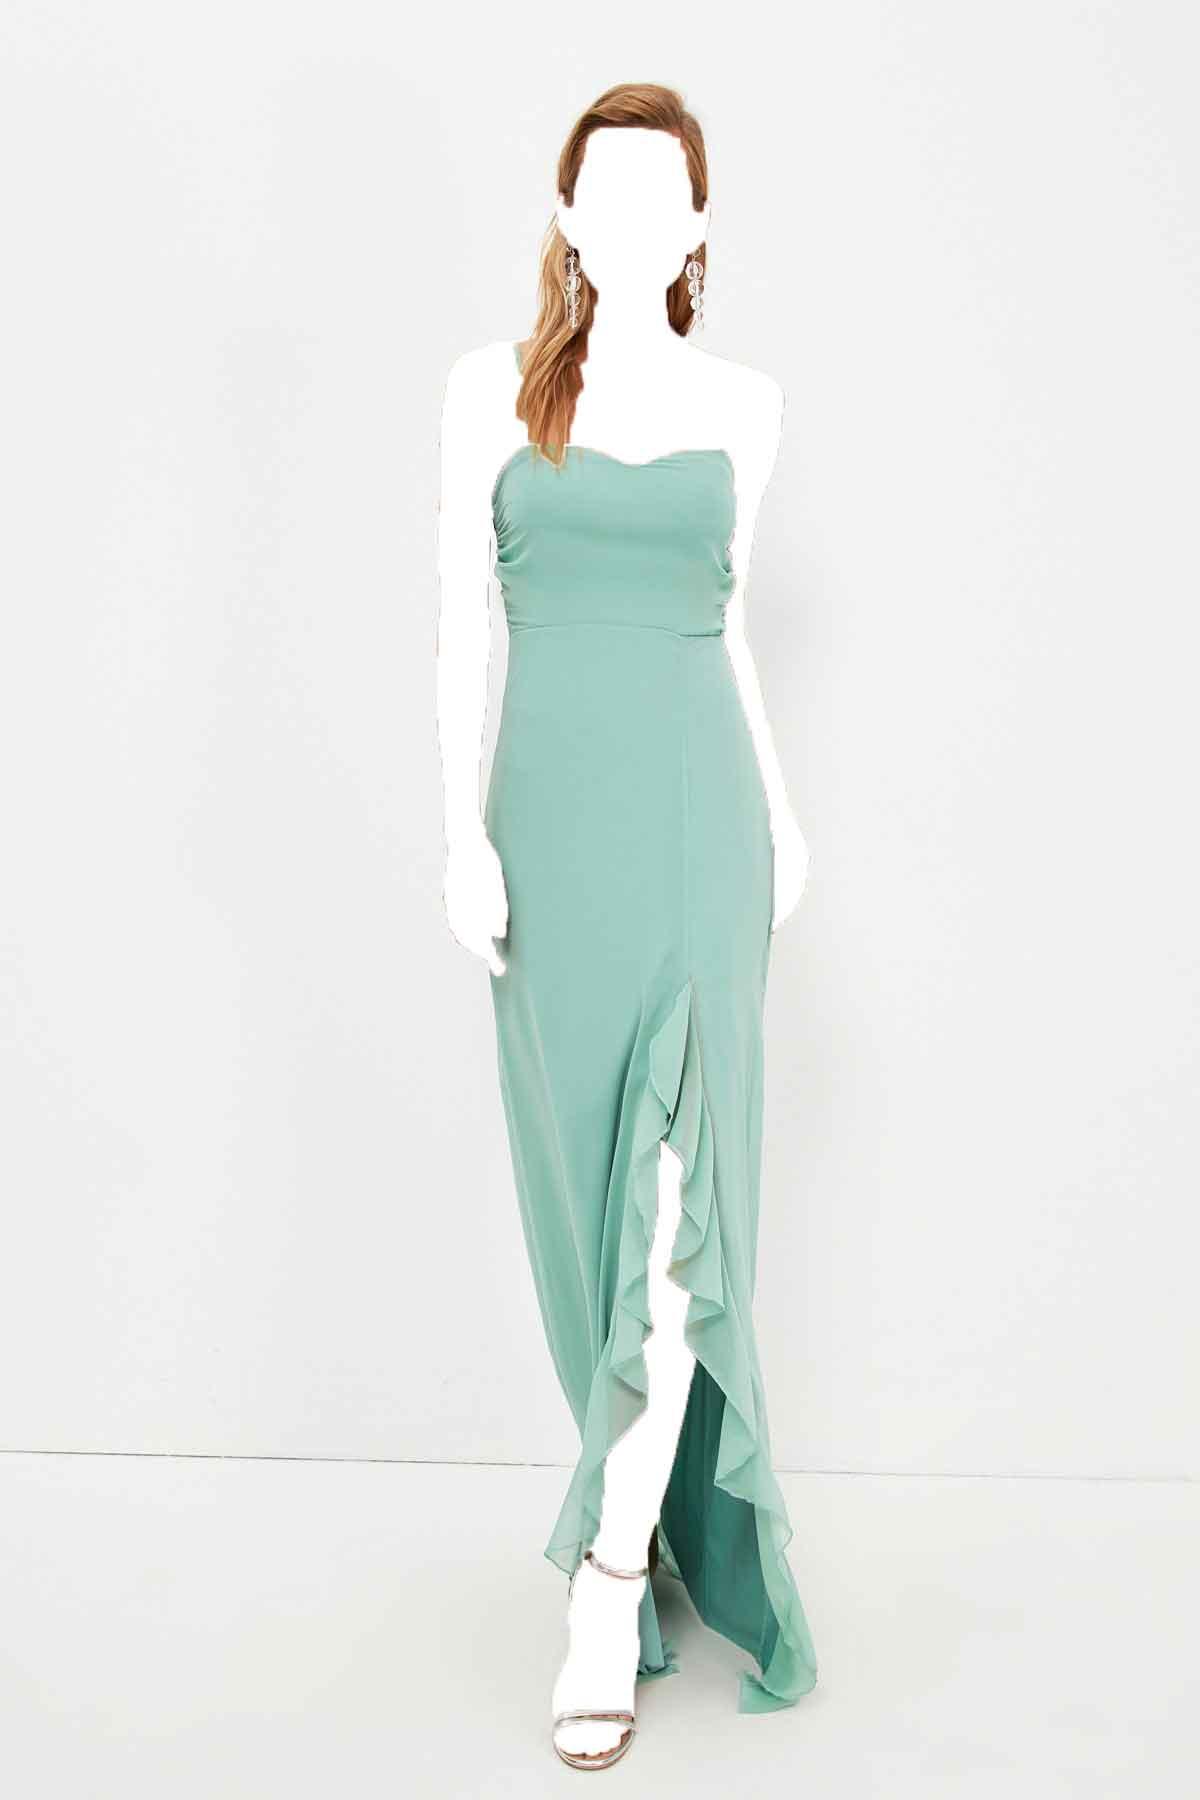 لباس مجلسی زنانه اسپرت جدید برند TRENDYOLMİLLA رنگ آبی کد ty115620317